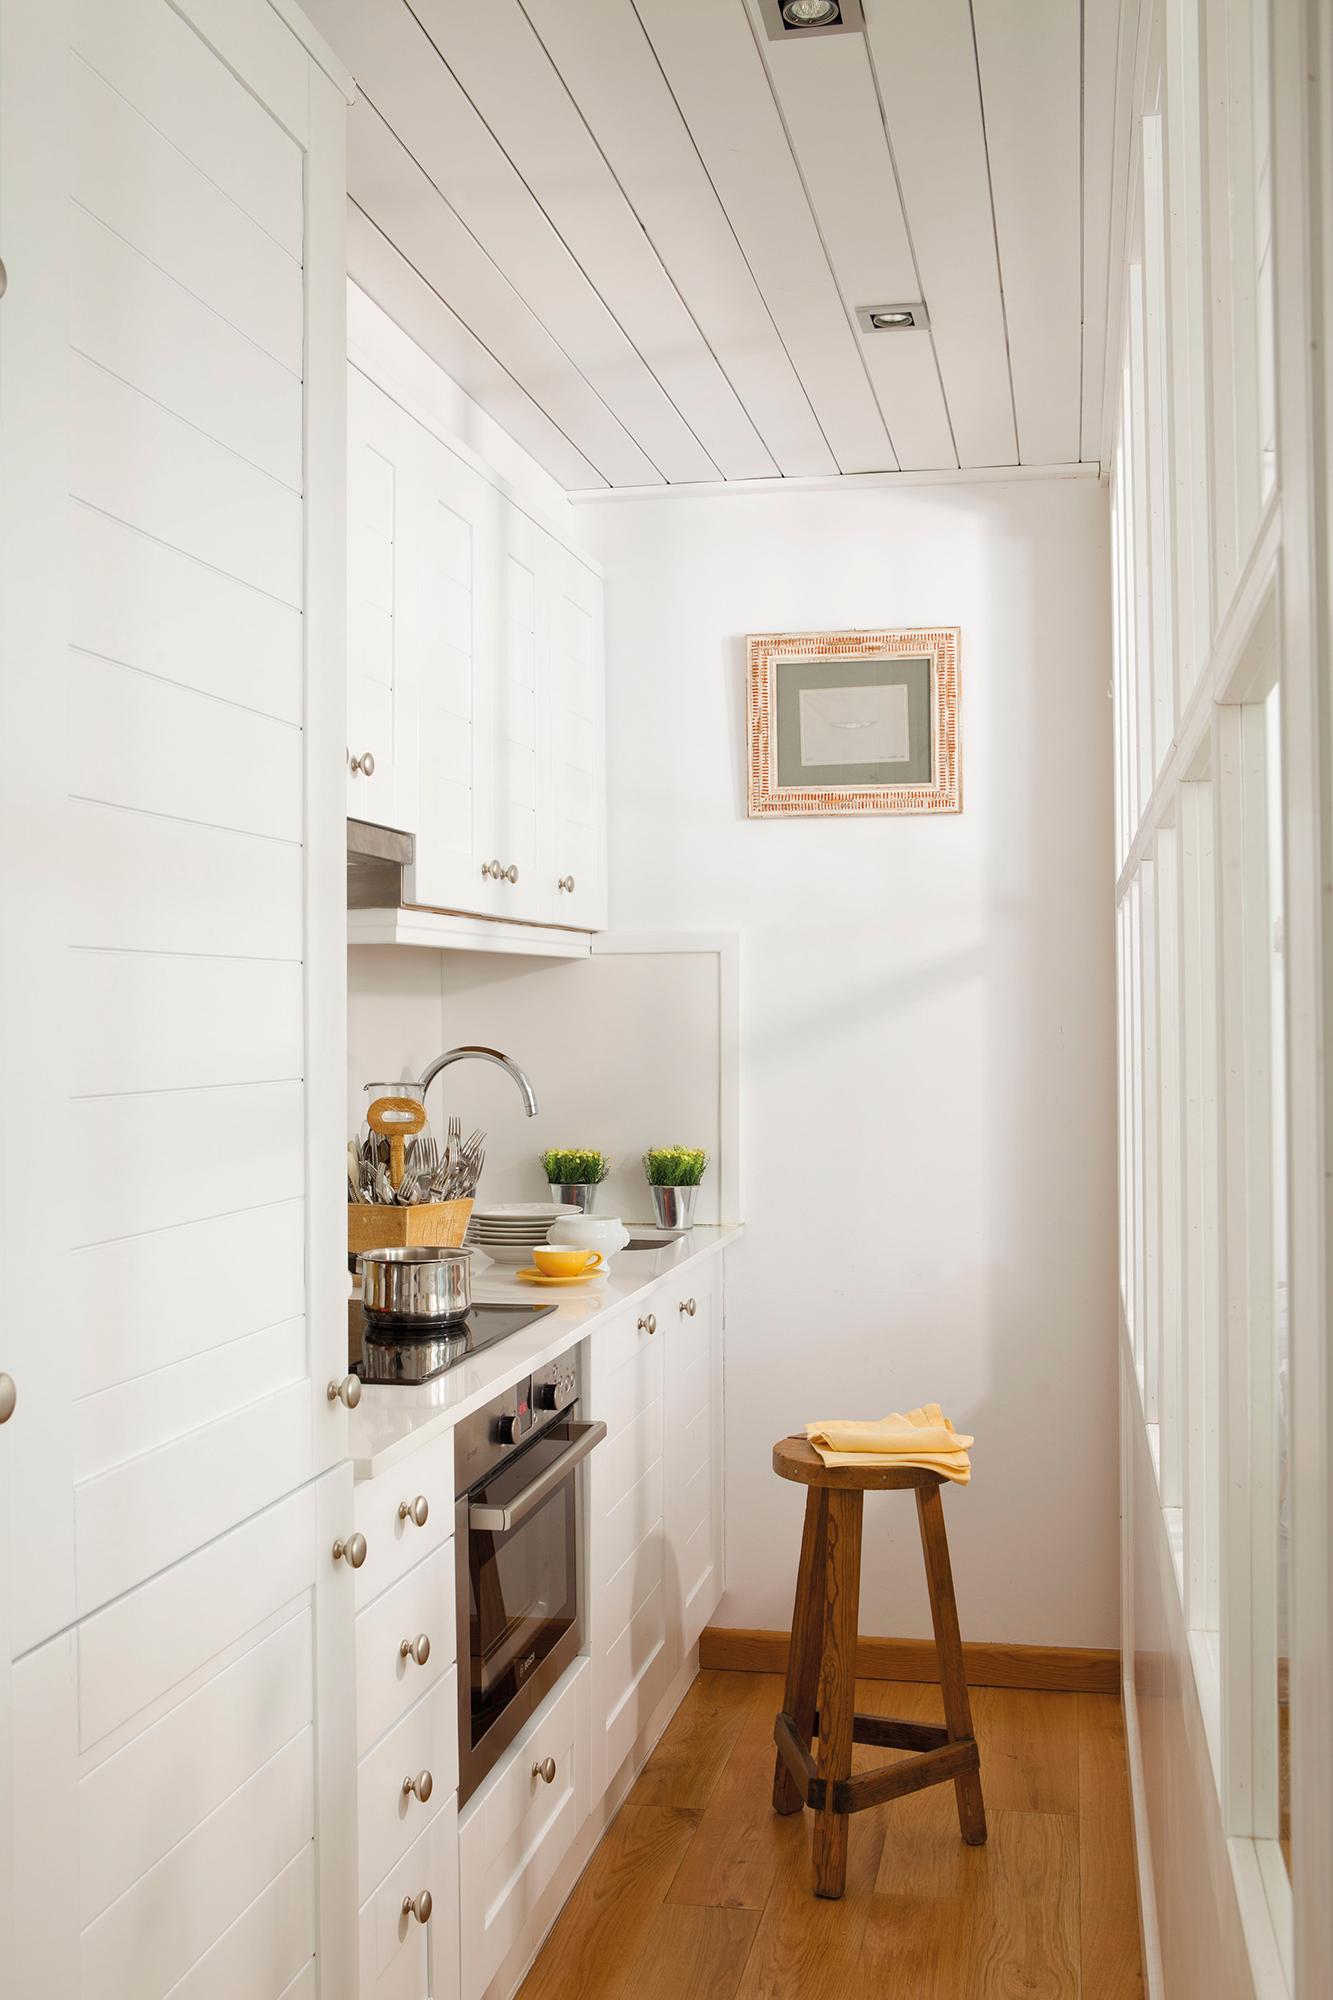 Cocinas peque as en un solo frente for Cocinas integrales para casas muy pequenas